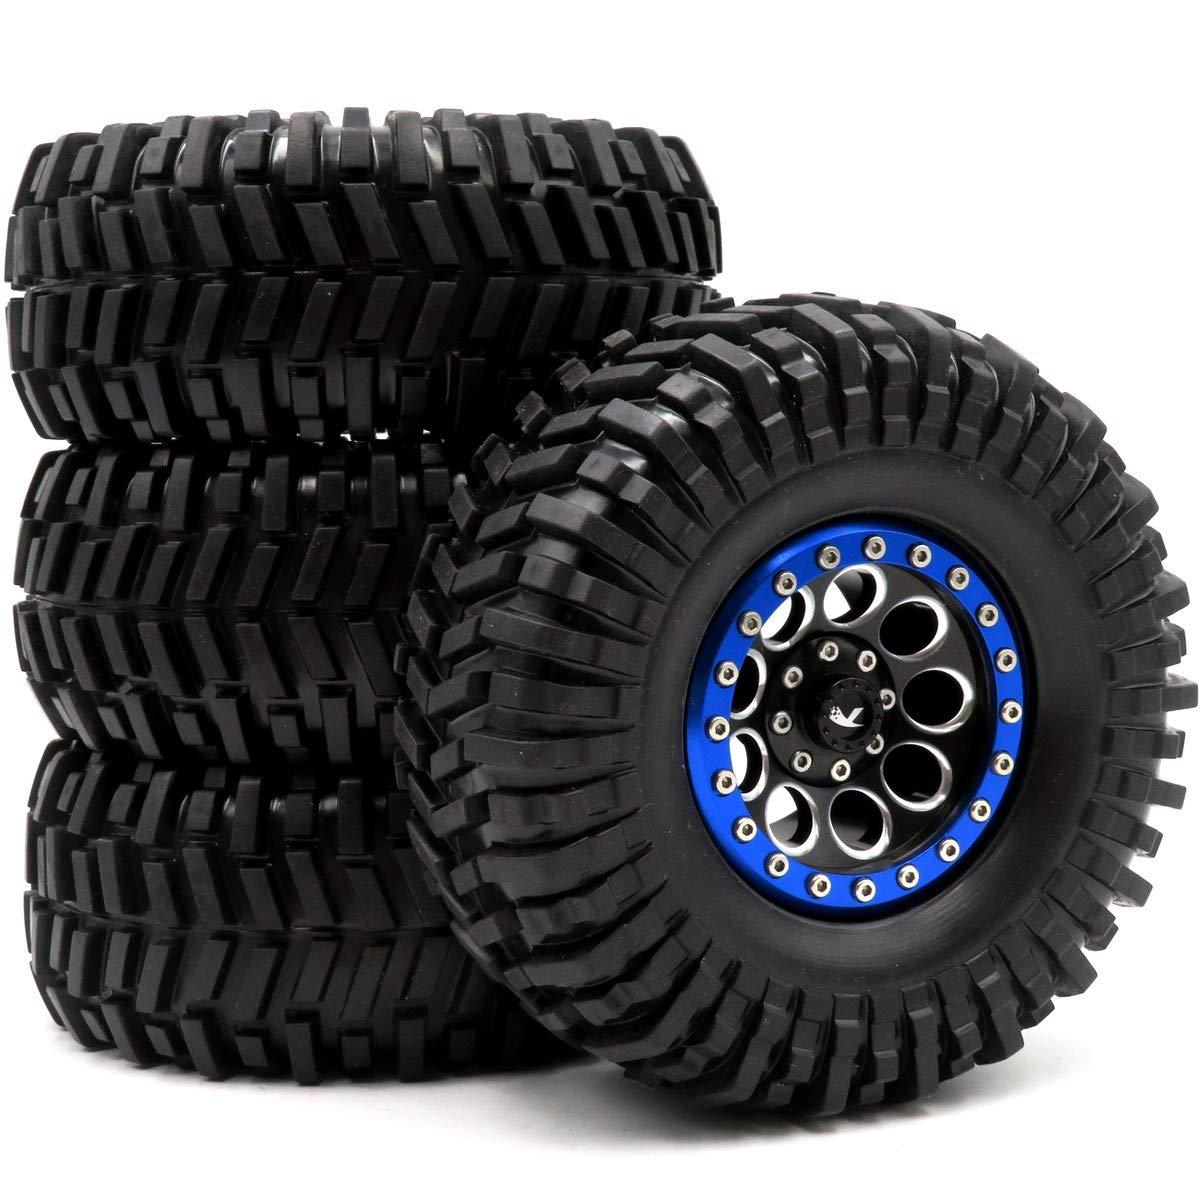 hobbysoul 4pcs RC Crawler 2.2 Mud Terrain Tires Tyres Sticky Height:125mm & Aluminum Alloy 2.2 Beadlock Wheels Rims Hex 12mm